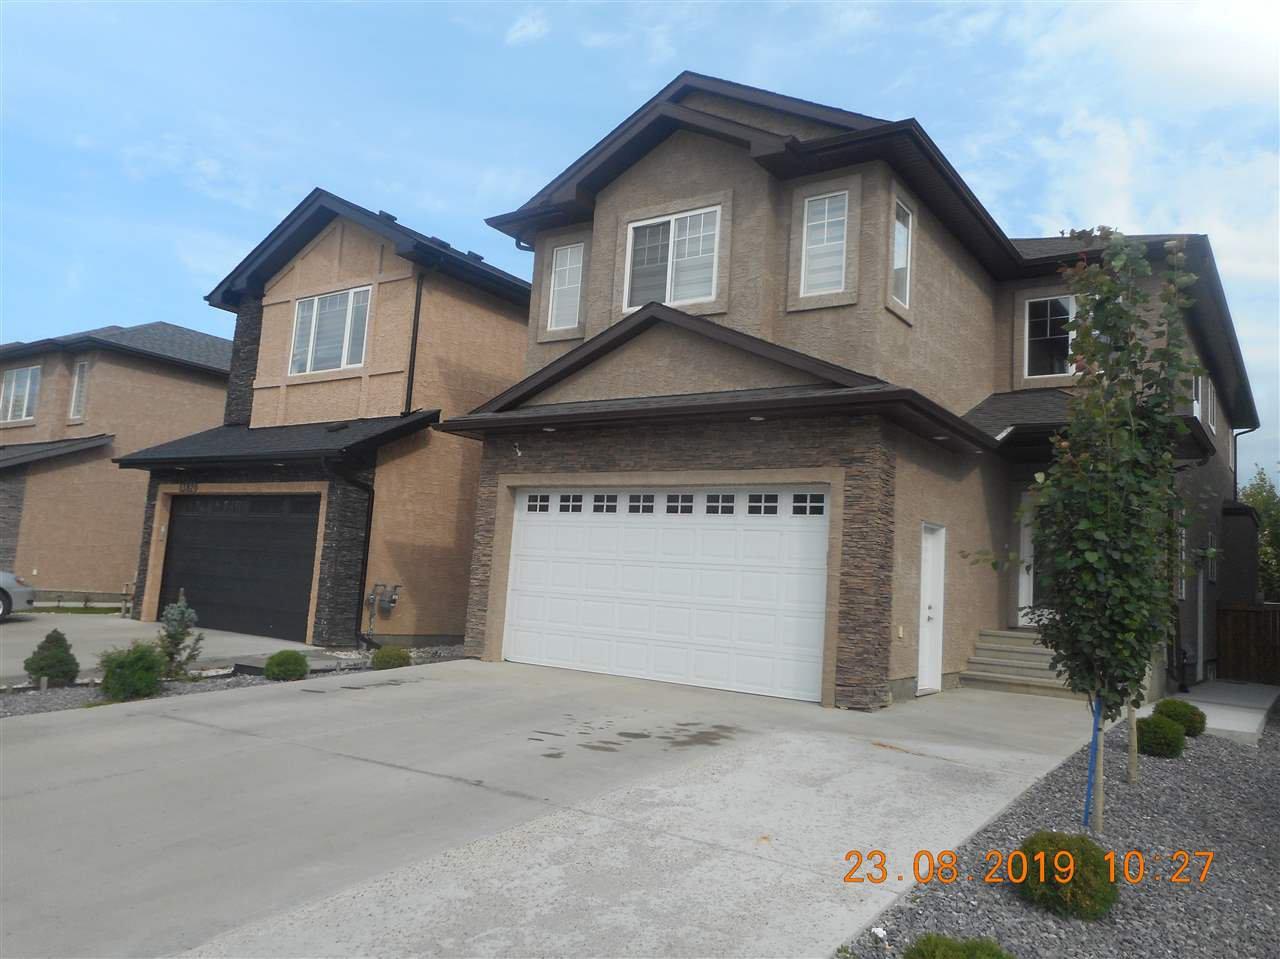 Main Photo: 13816 163 Avenue in Edmonton: Zone 27 House for sale : MLS®# E4171056